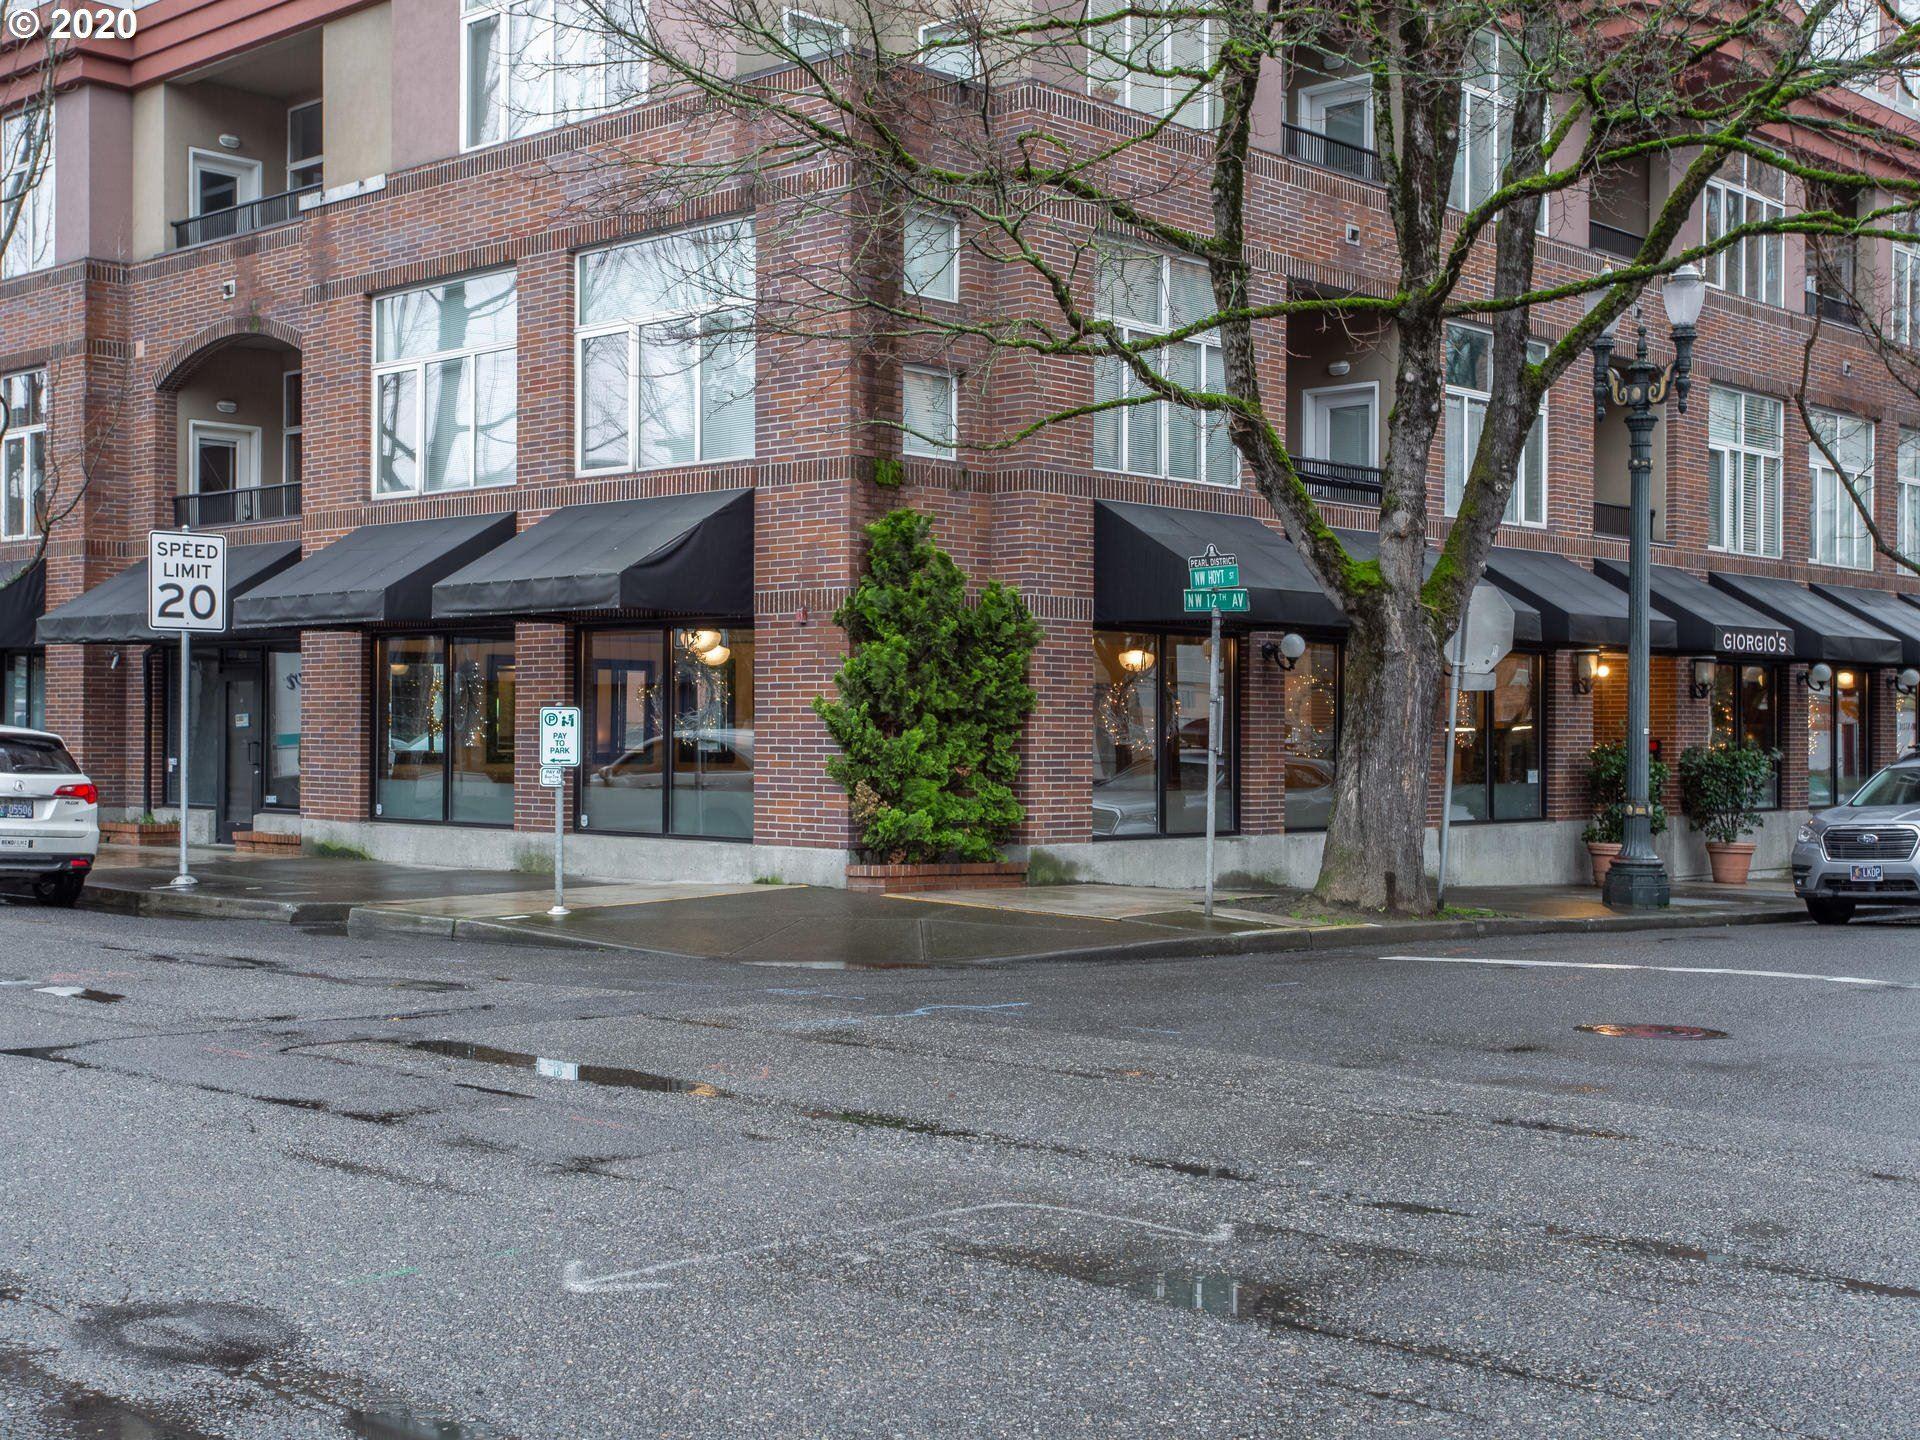 1131 NW HOYT ST, Portland, OR 97209 - #: 20430580